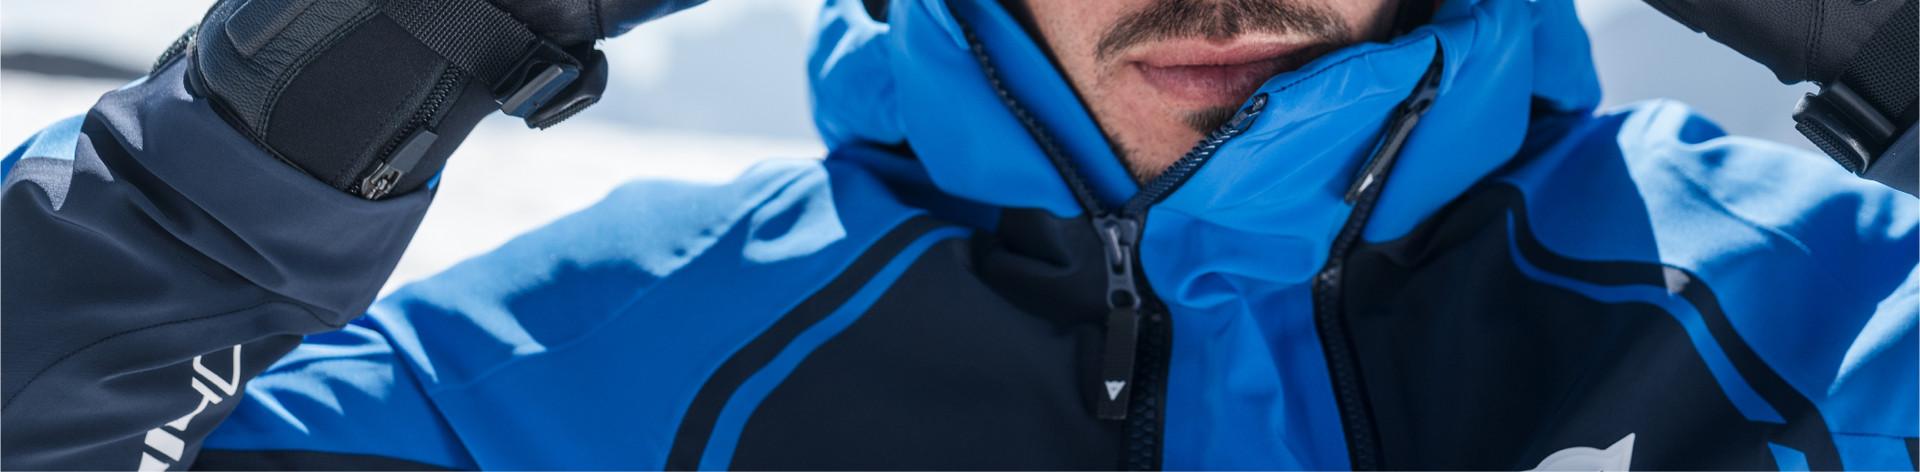 Dainese Winter Sports mountain lifestyle jackets